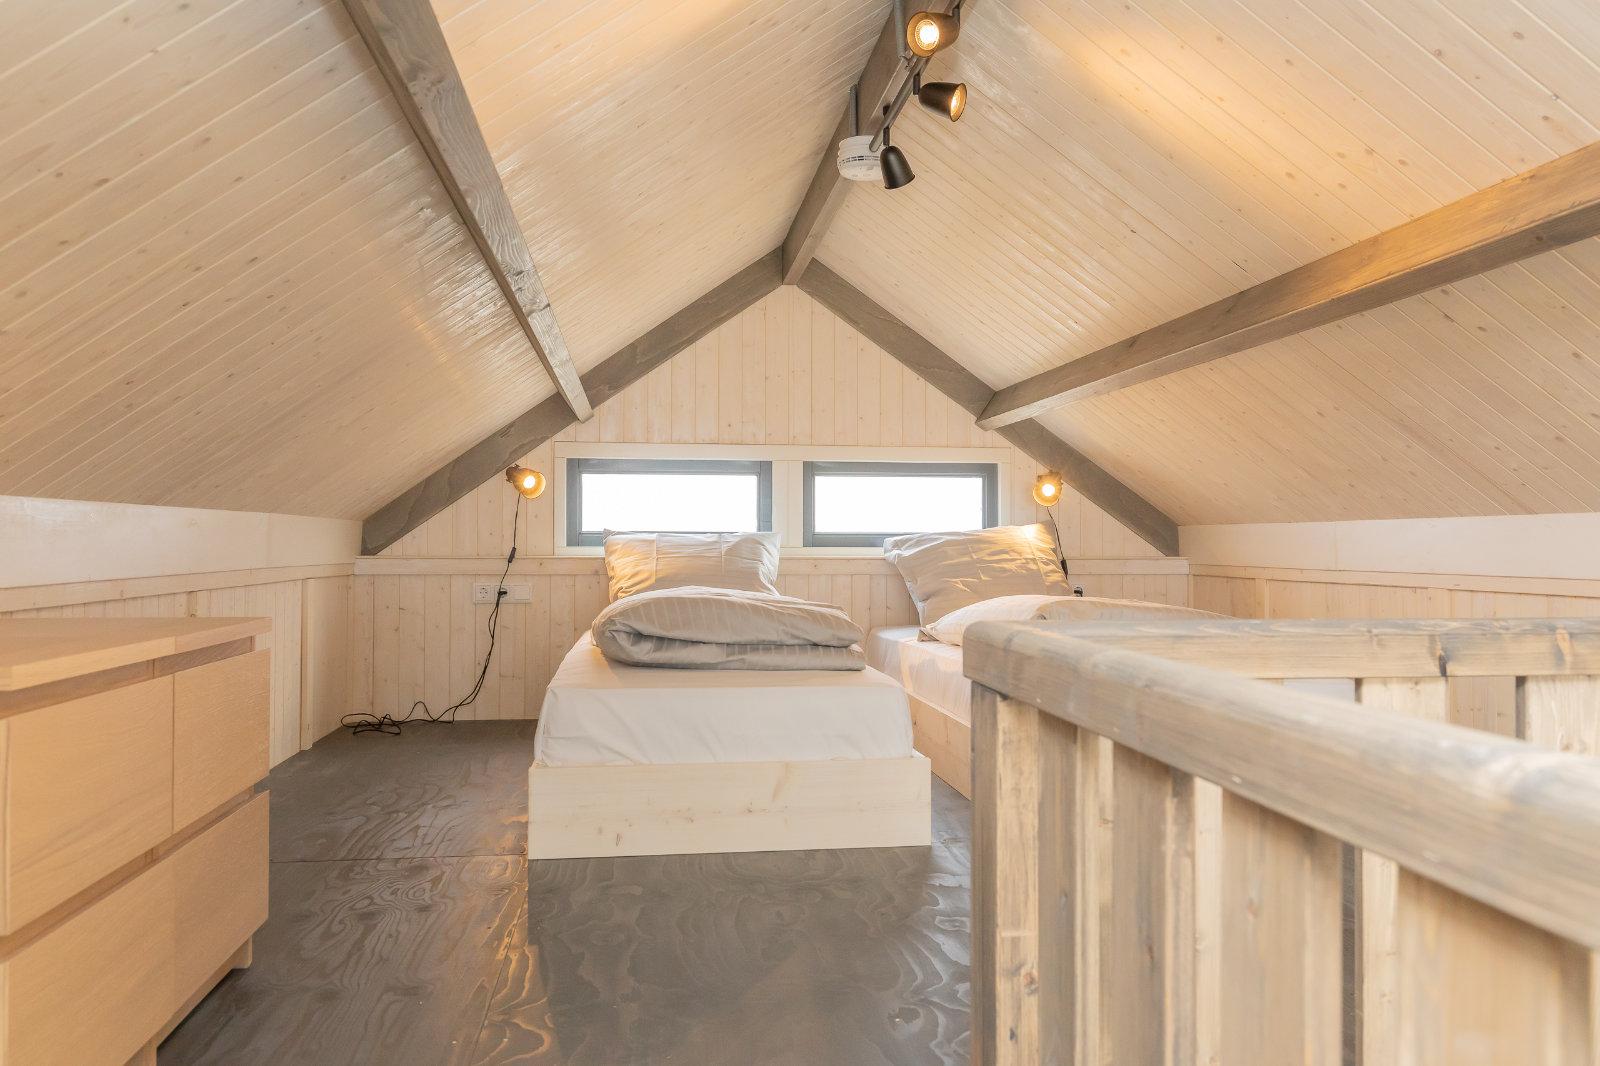 MK4 tiny house - bedroom under the attic